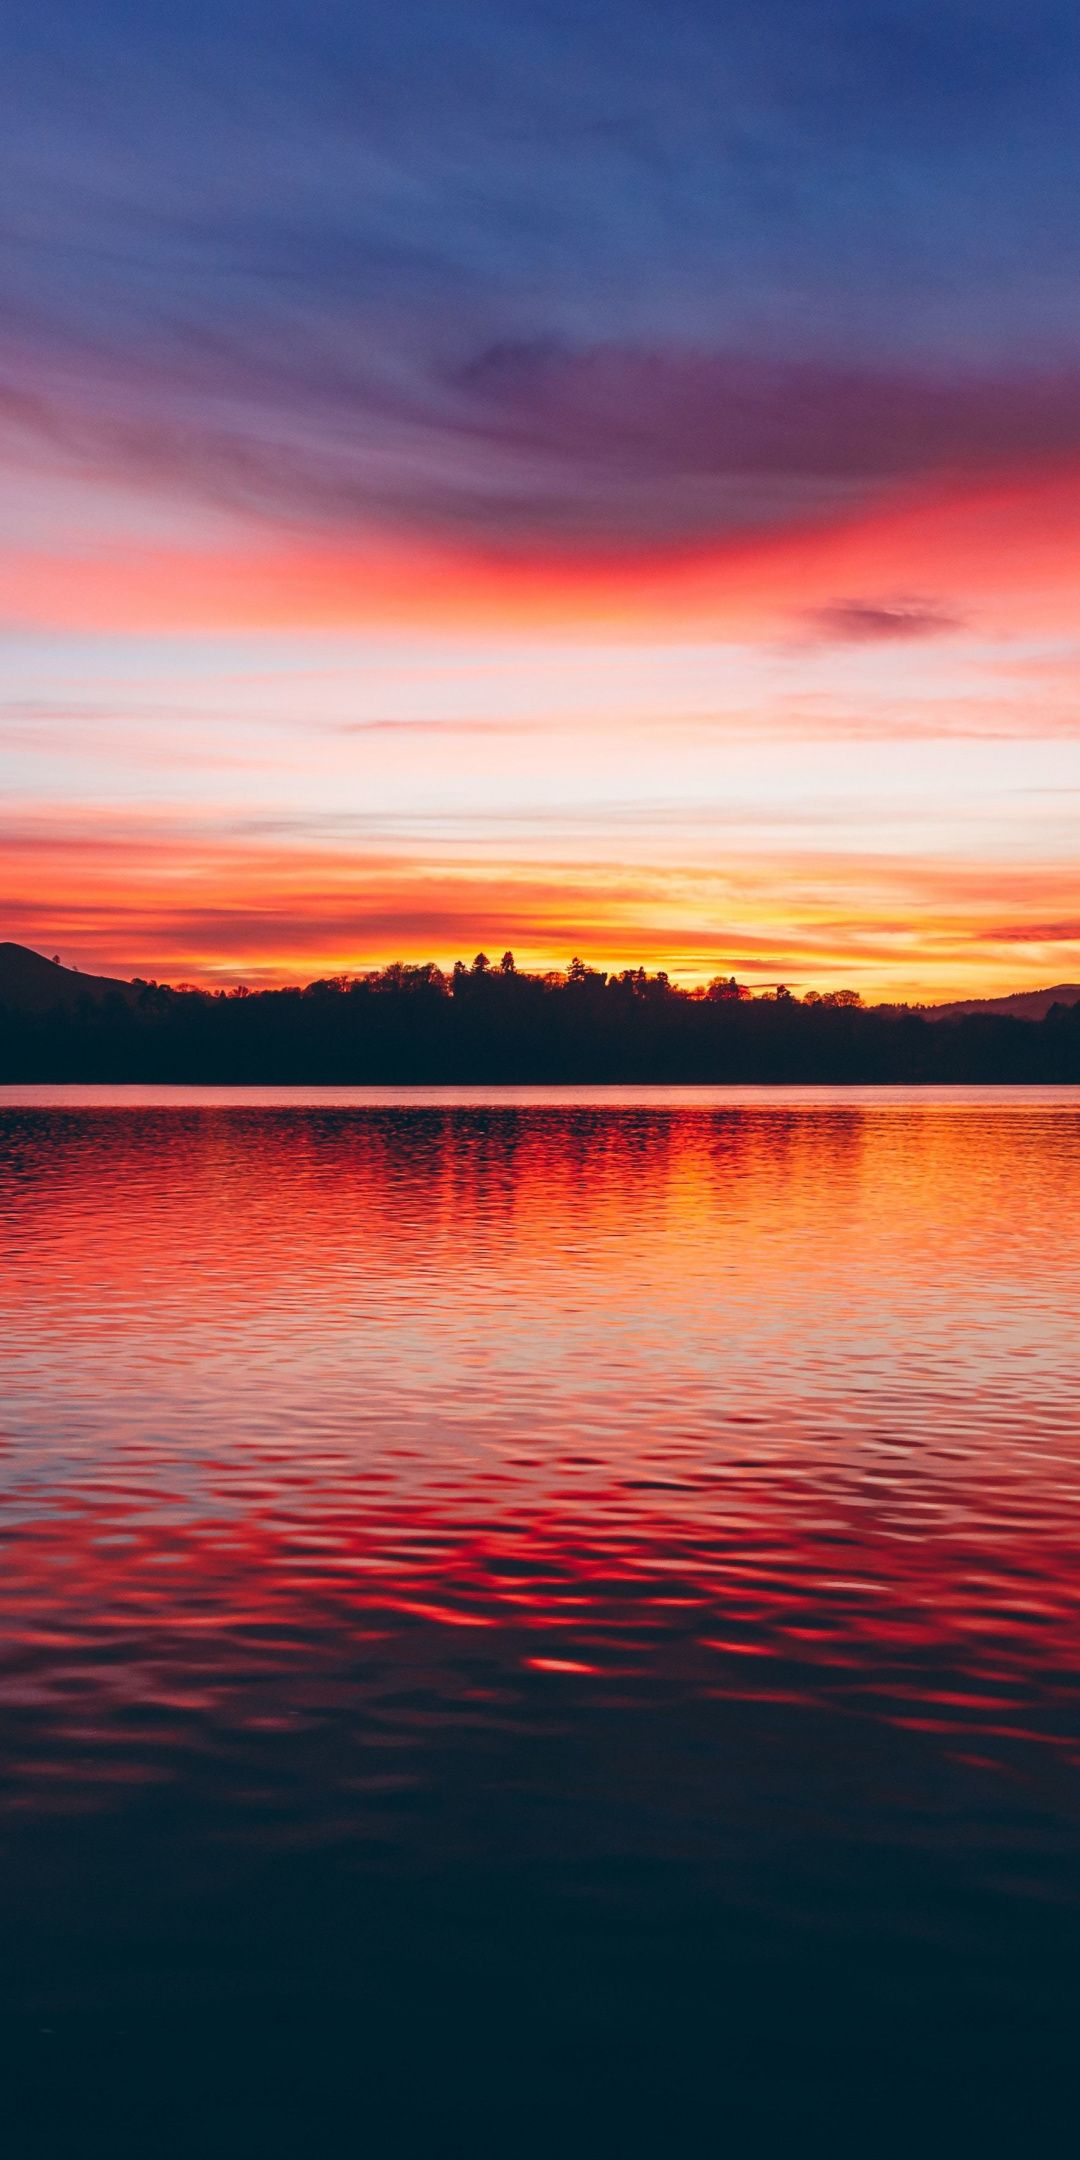 Lake Sunset Horizon Beautiful 1080x2160 Wallpaper 風景